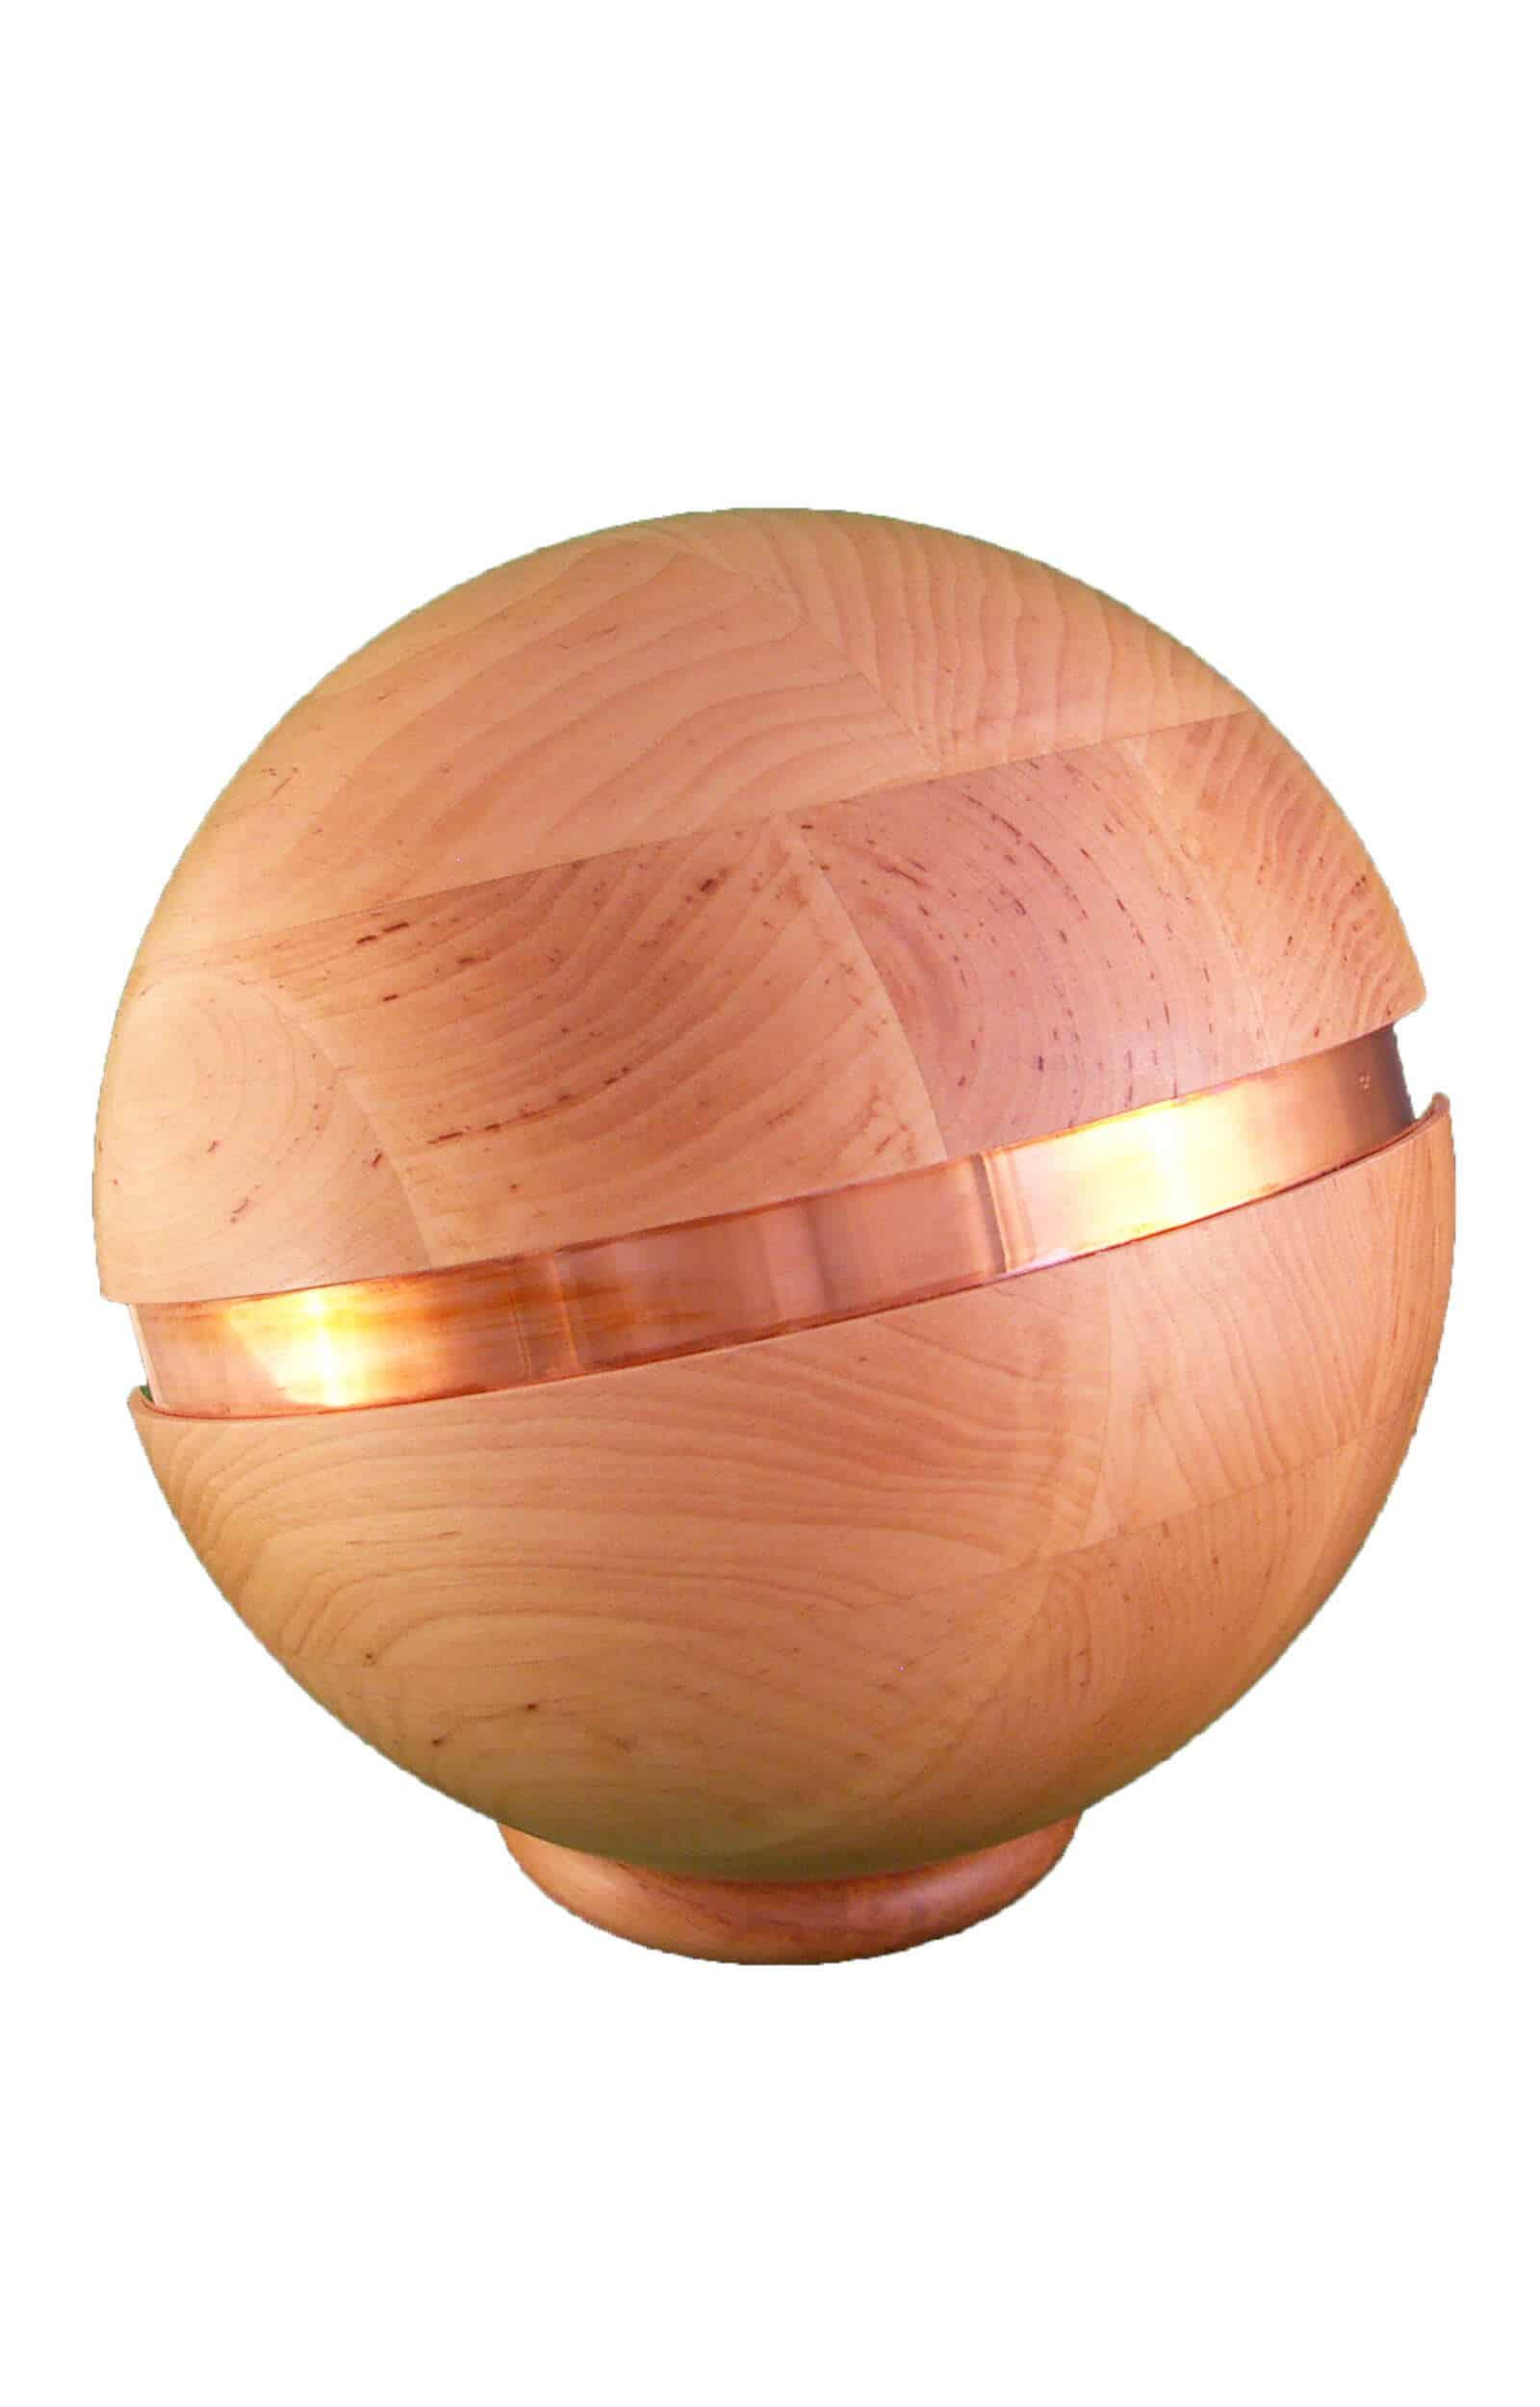 Urne aus Holz, holzurne mit metallband, Kugelförmige Urne